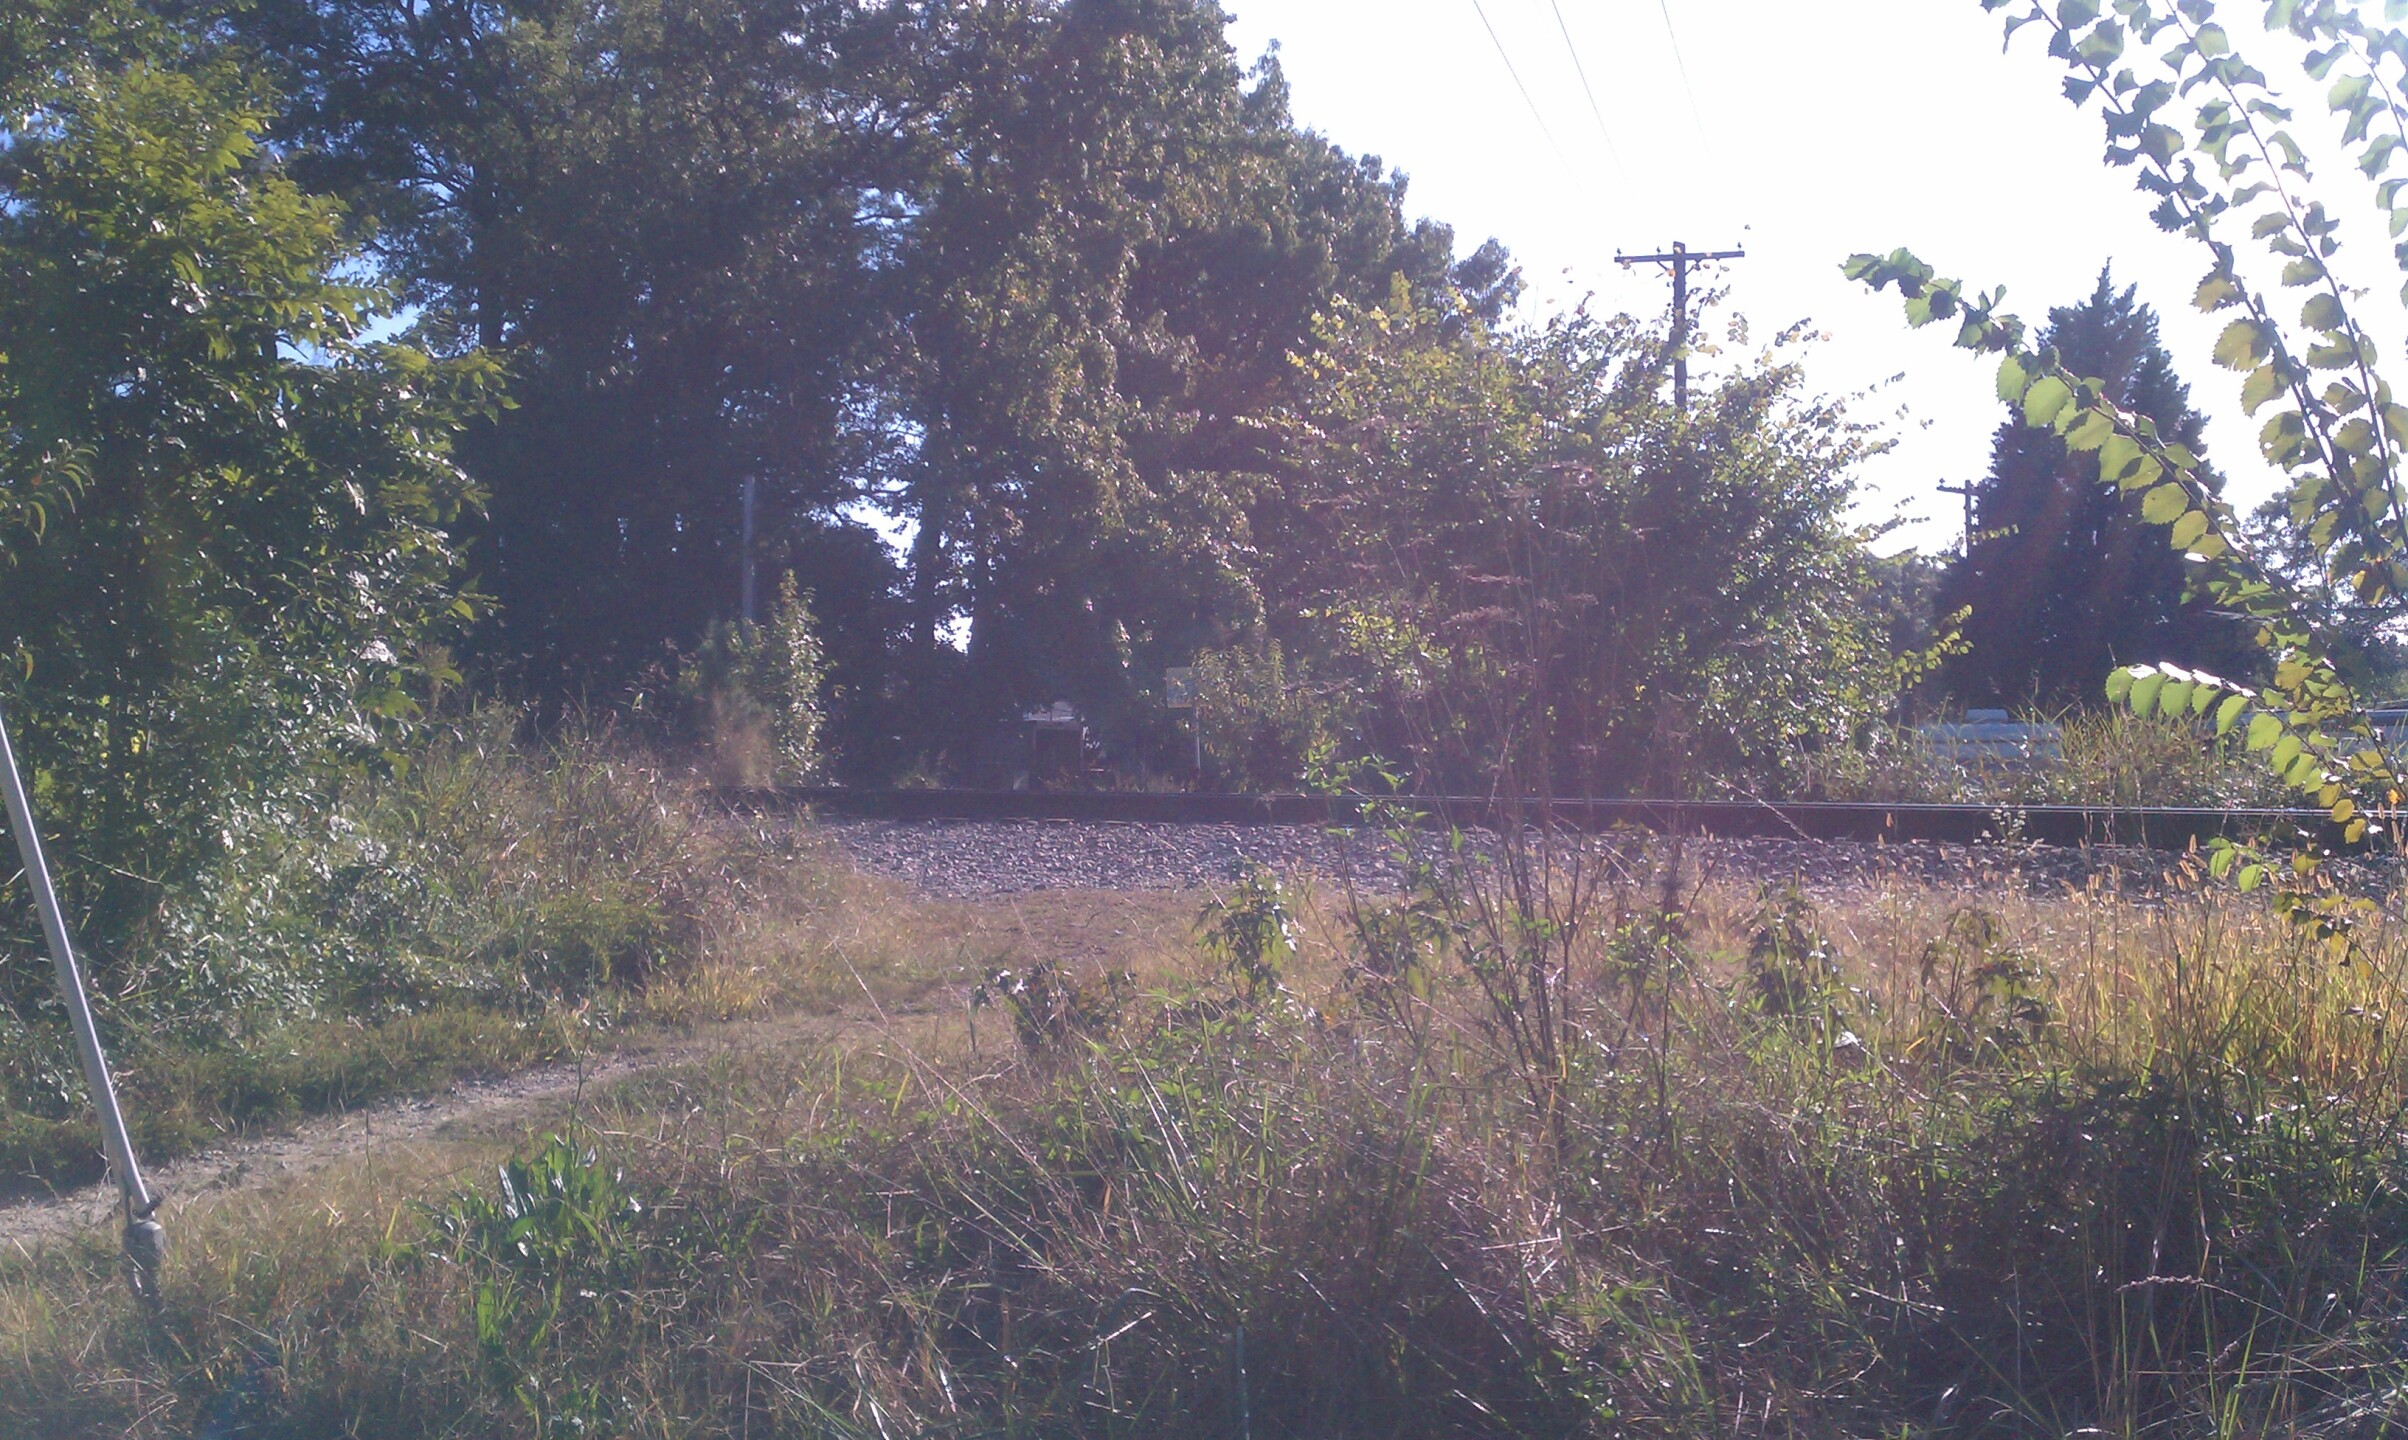 Photos: Update: Train severs 10-year-old boy's leg in NewportNews